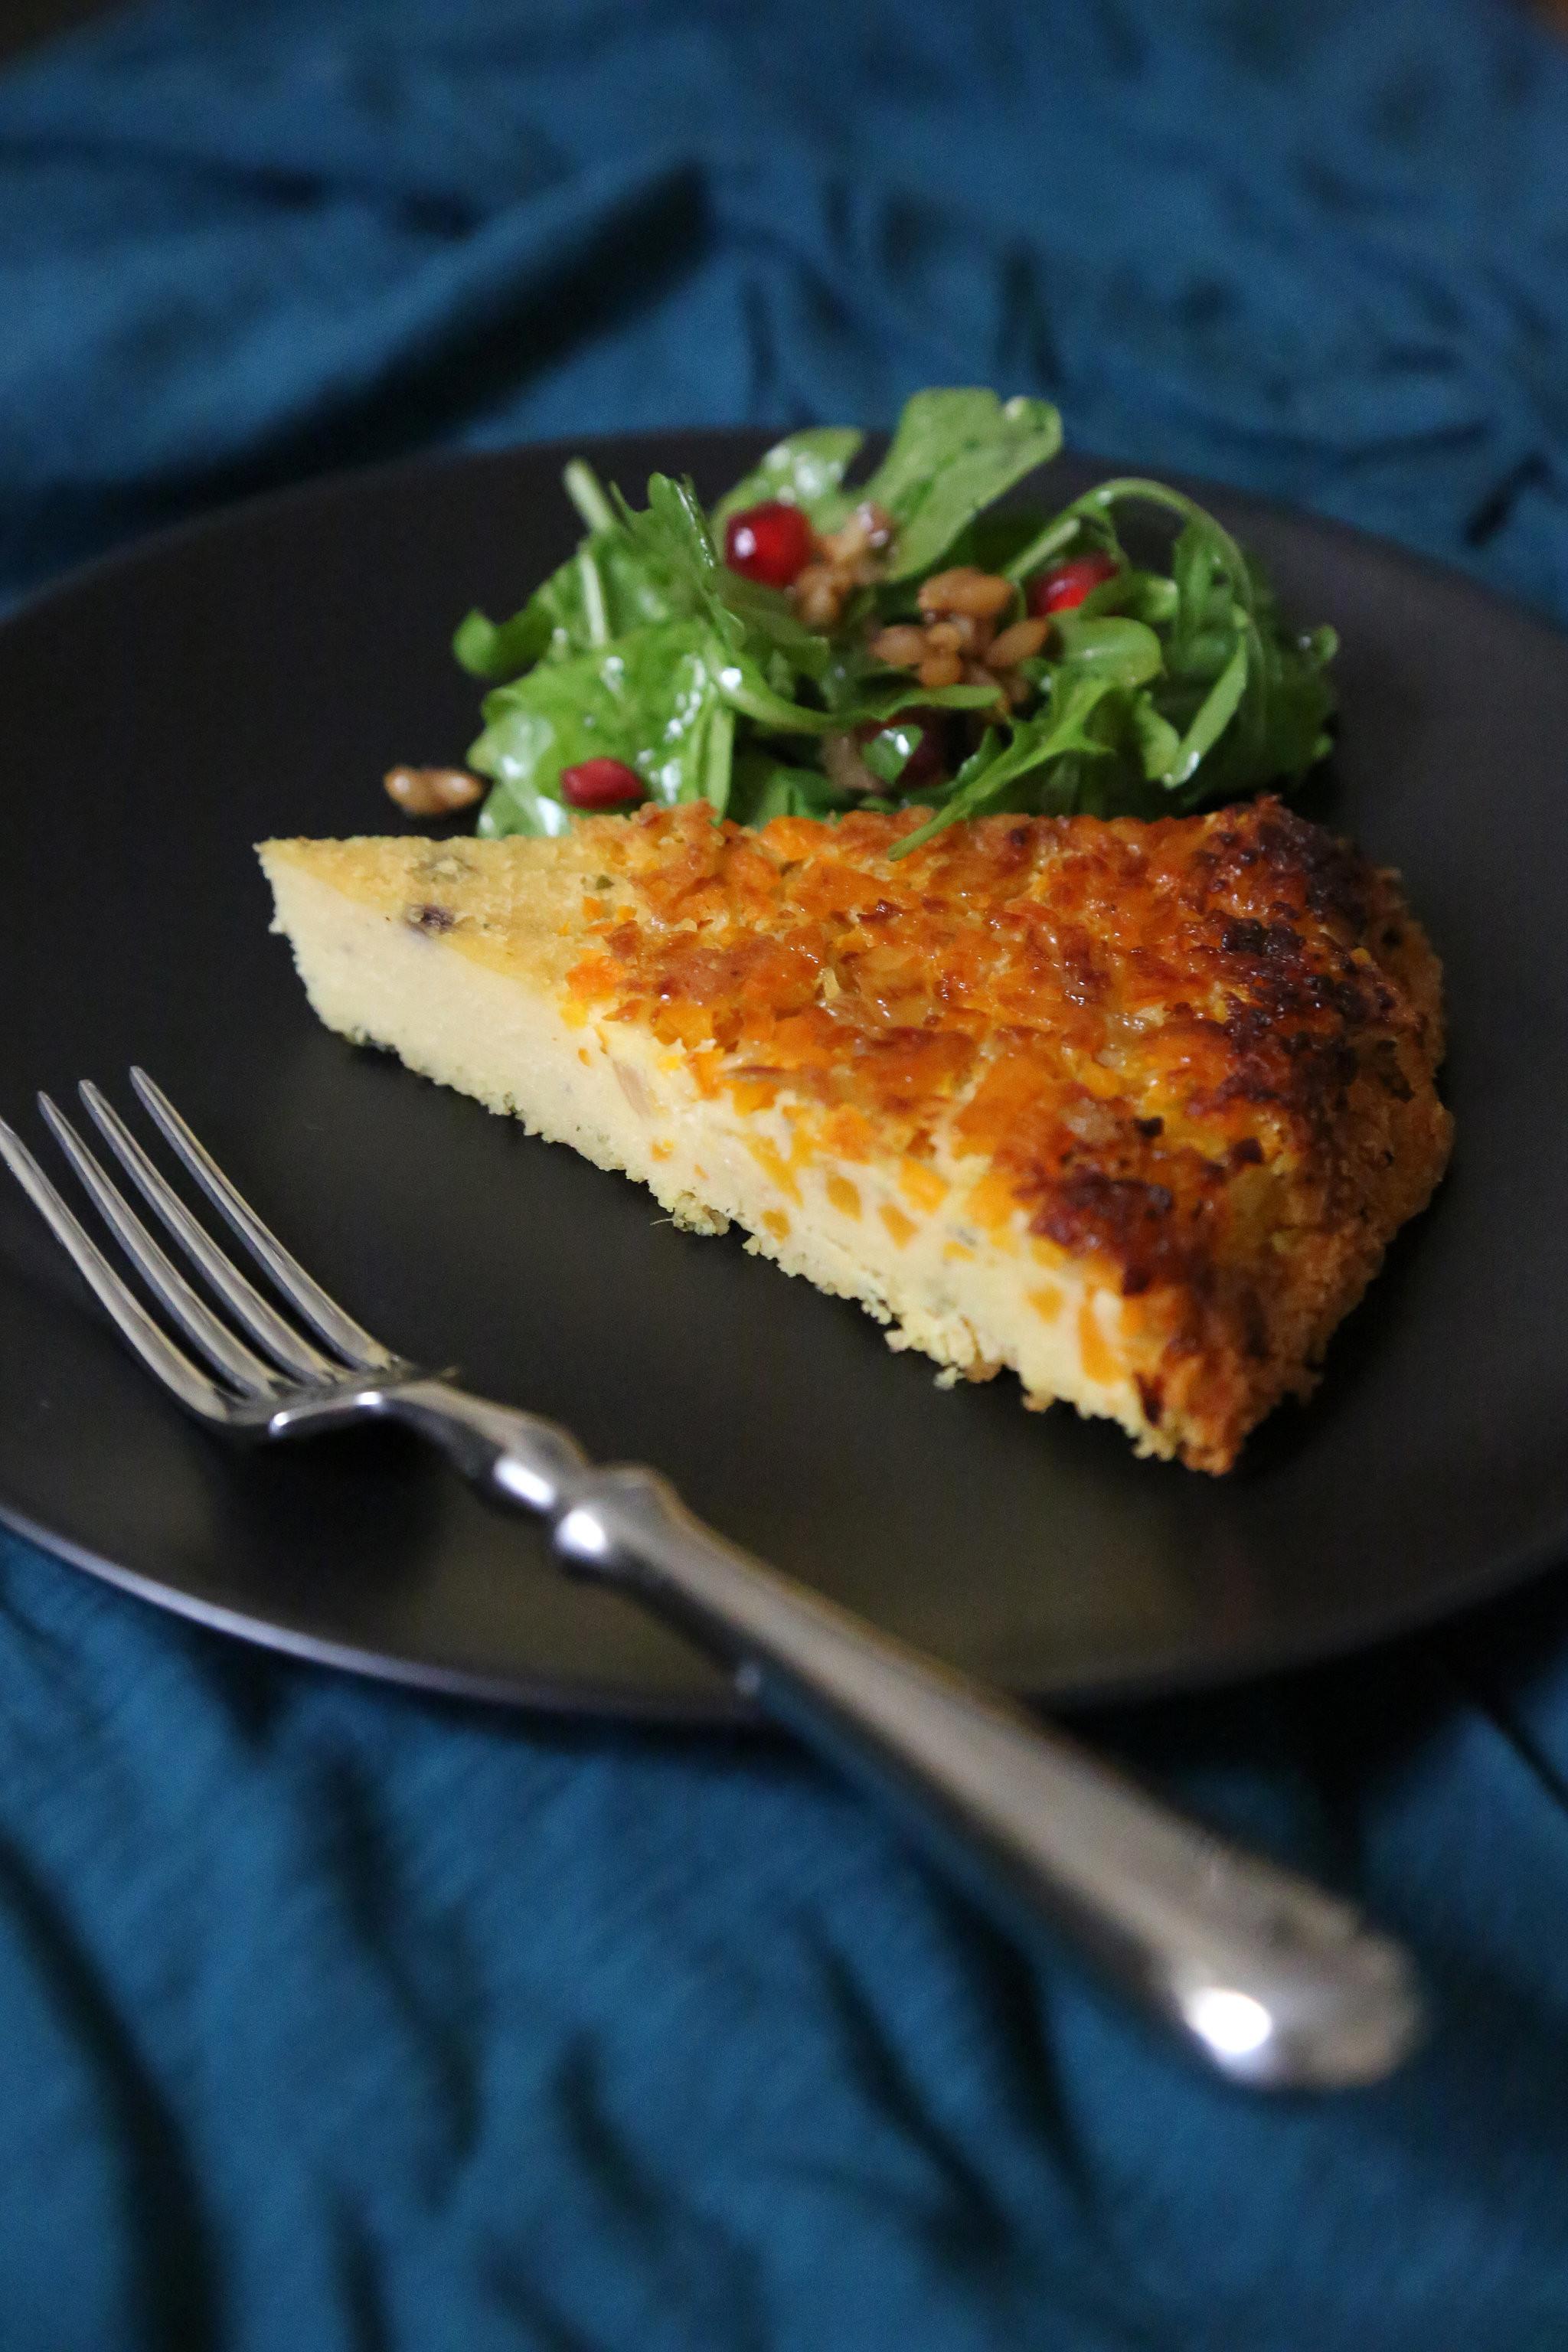 Vegetarian Main Dish For Thanksgiving  Delicious Ve arian Thanksgiving Main Dish